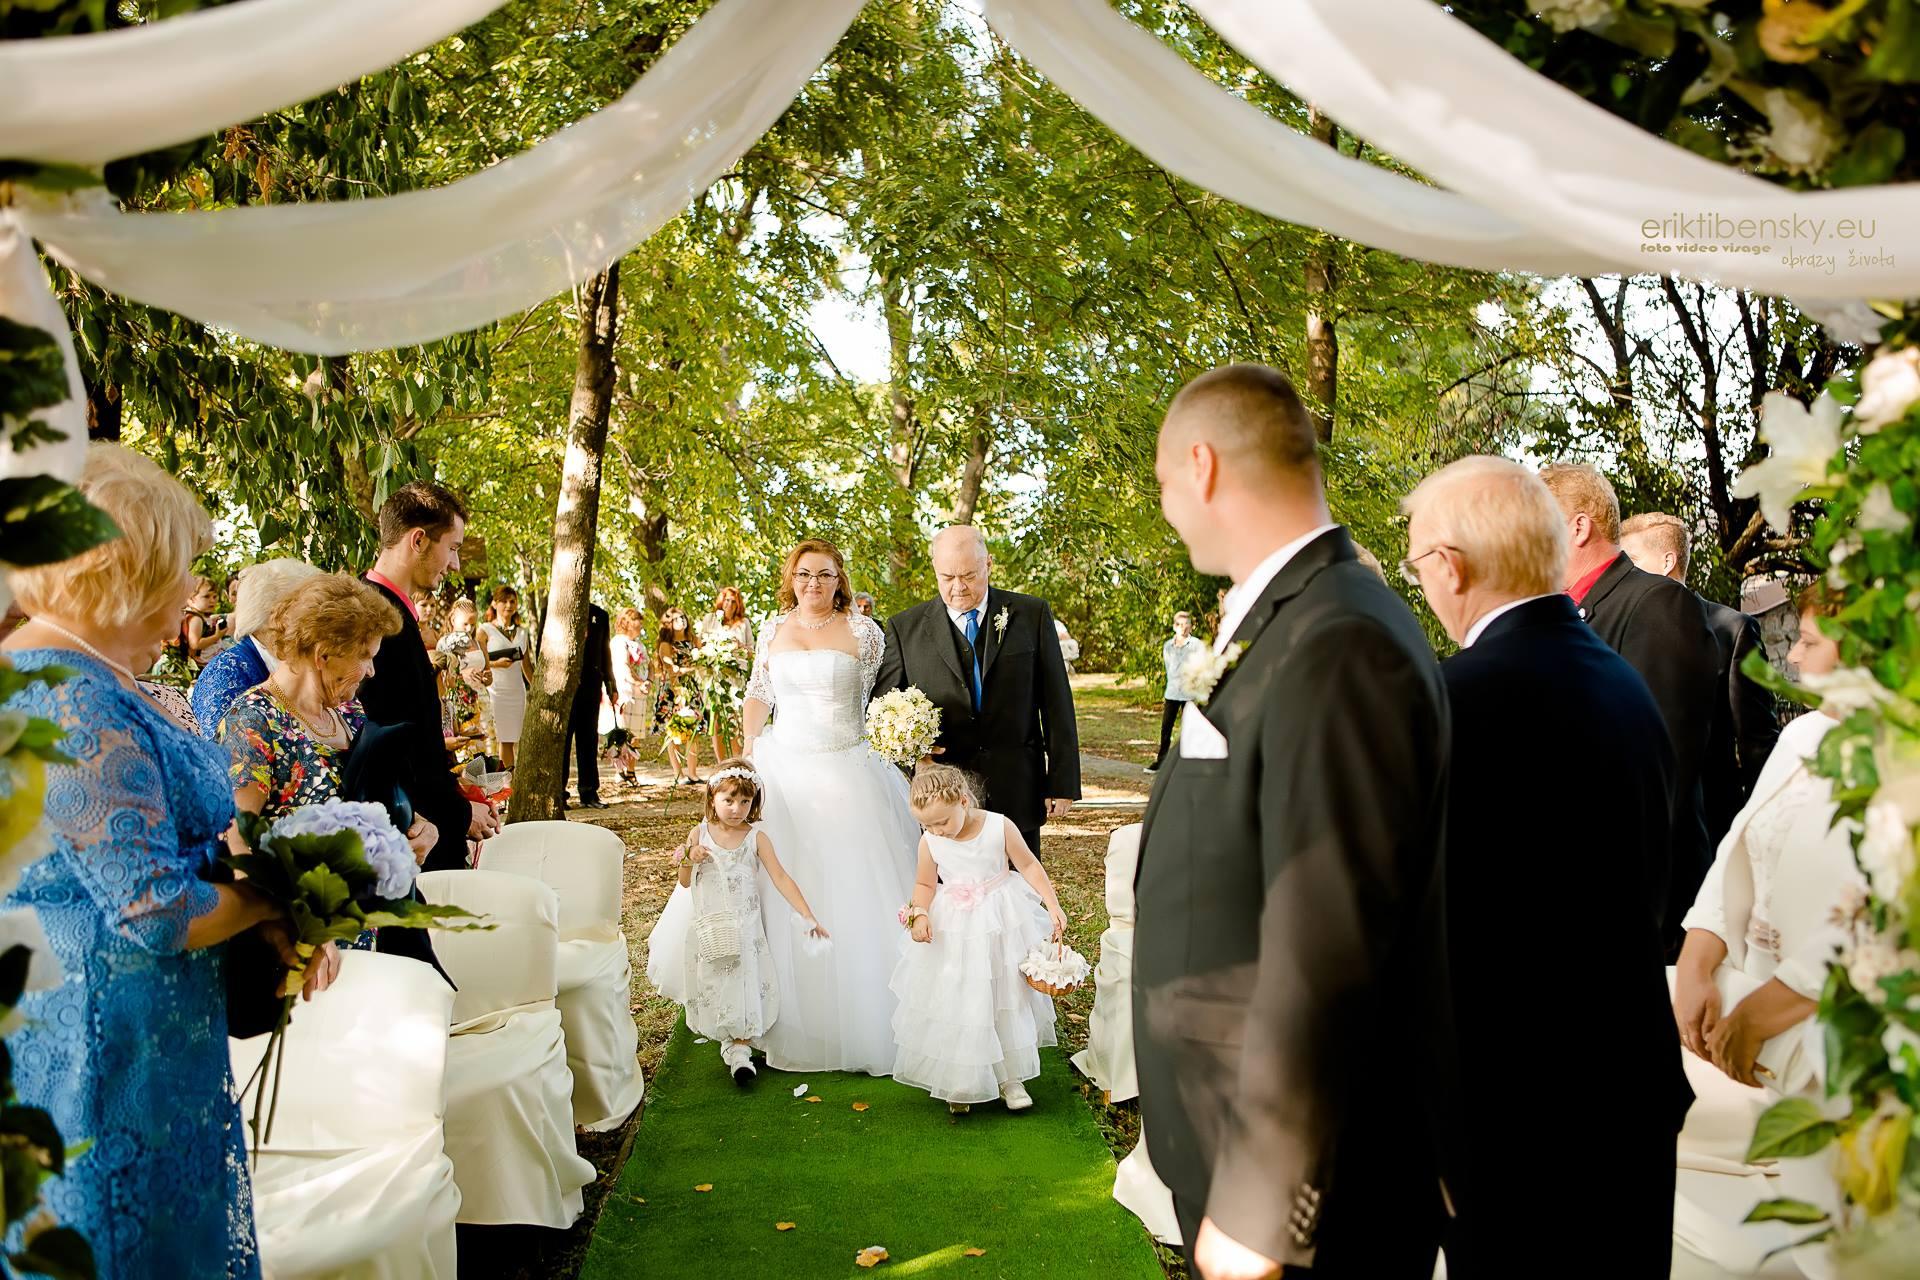 eriktibensky-eu-svadobny-fotograf-wedding-photographer-3033